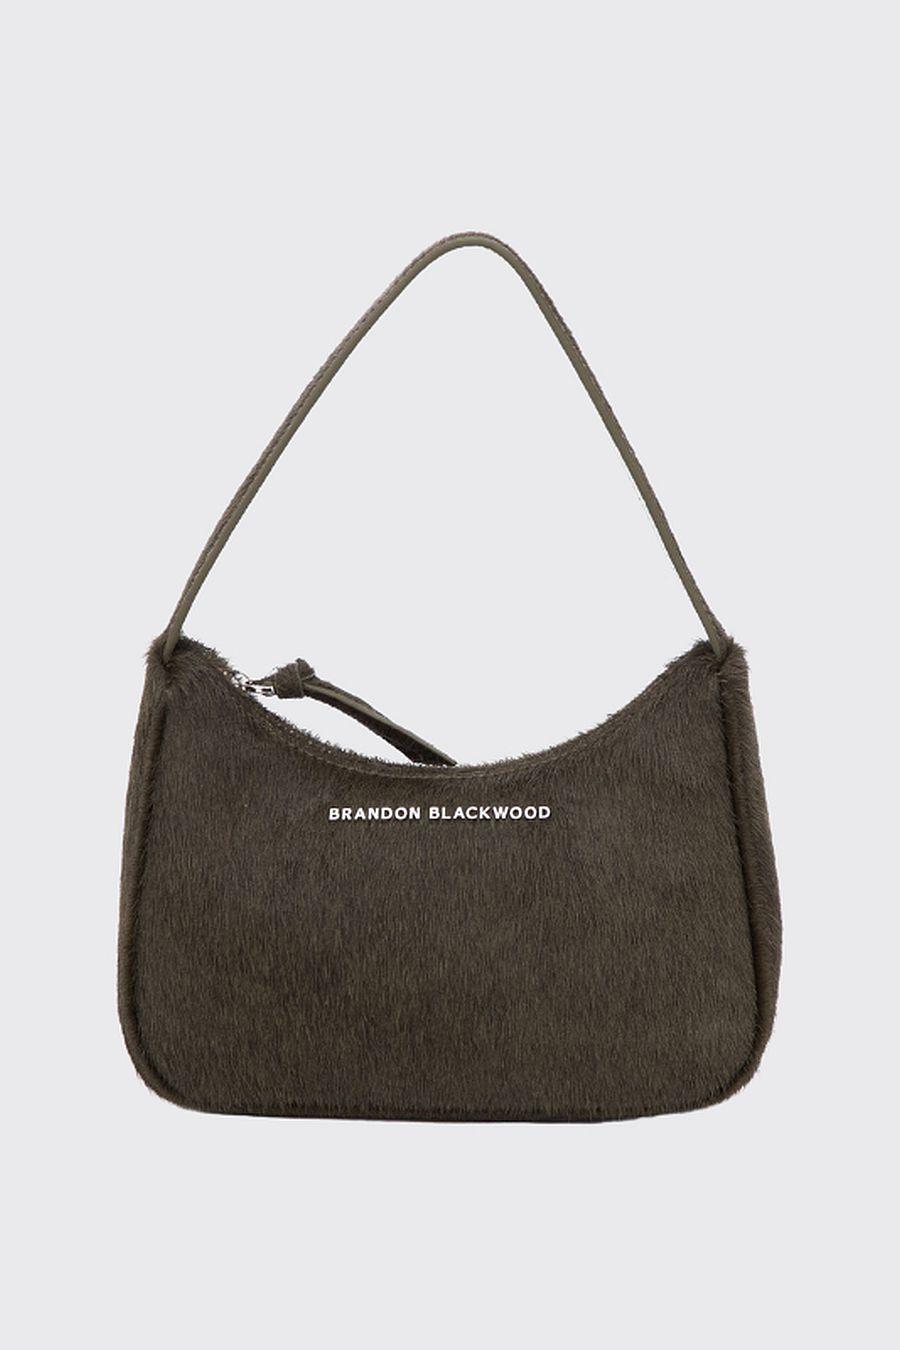 Brandon Blackwood SYL Bag - Green Ponyhair